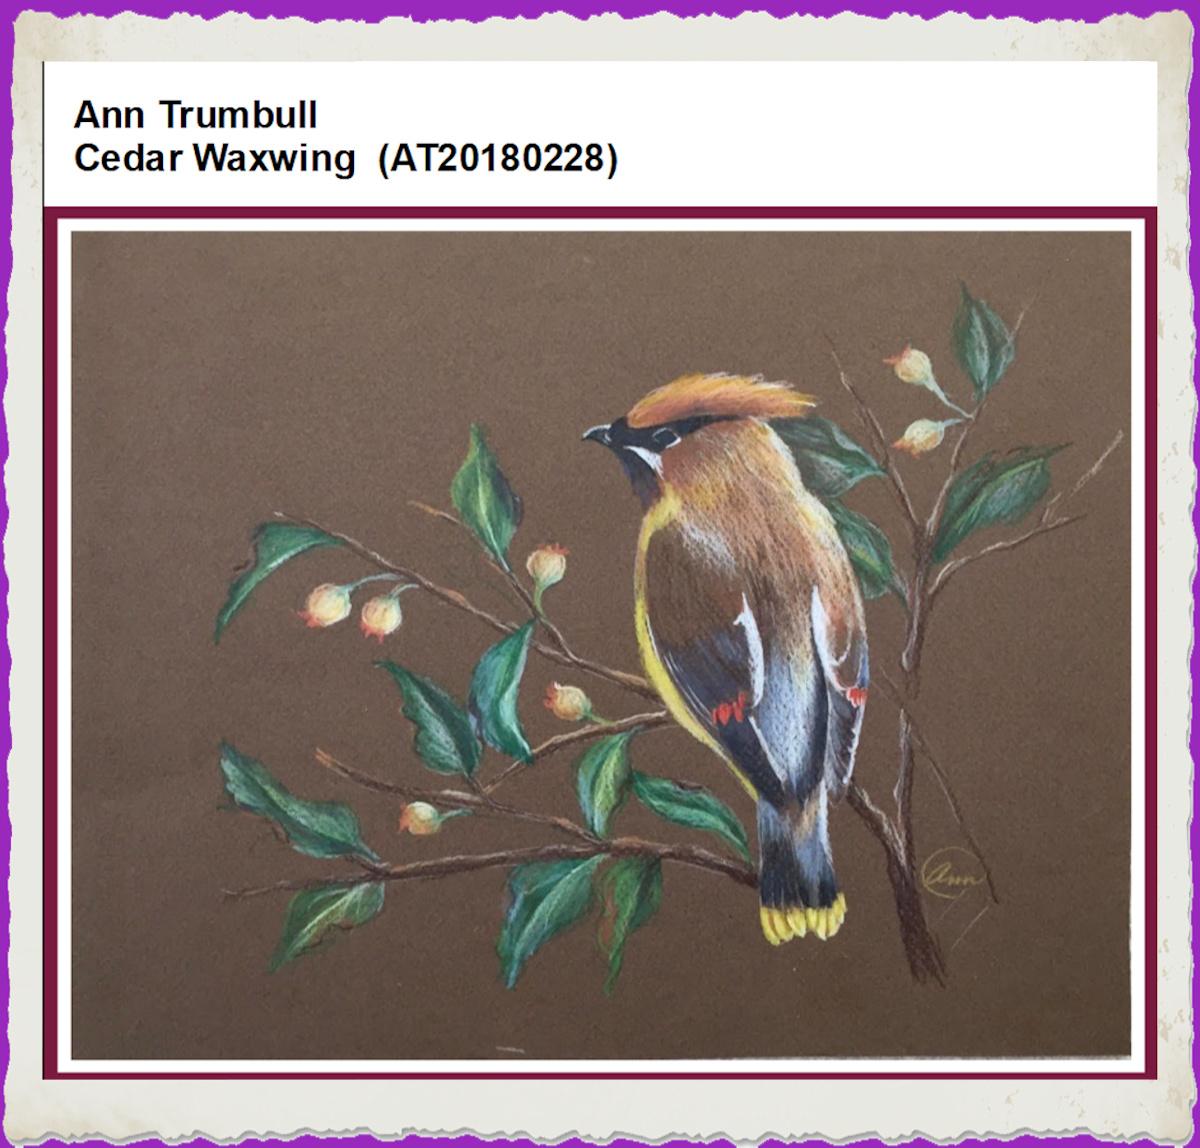 ann-trumbull-cedar-waxwing-frame-2.jpg